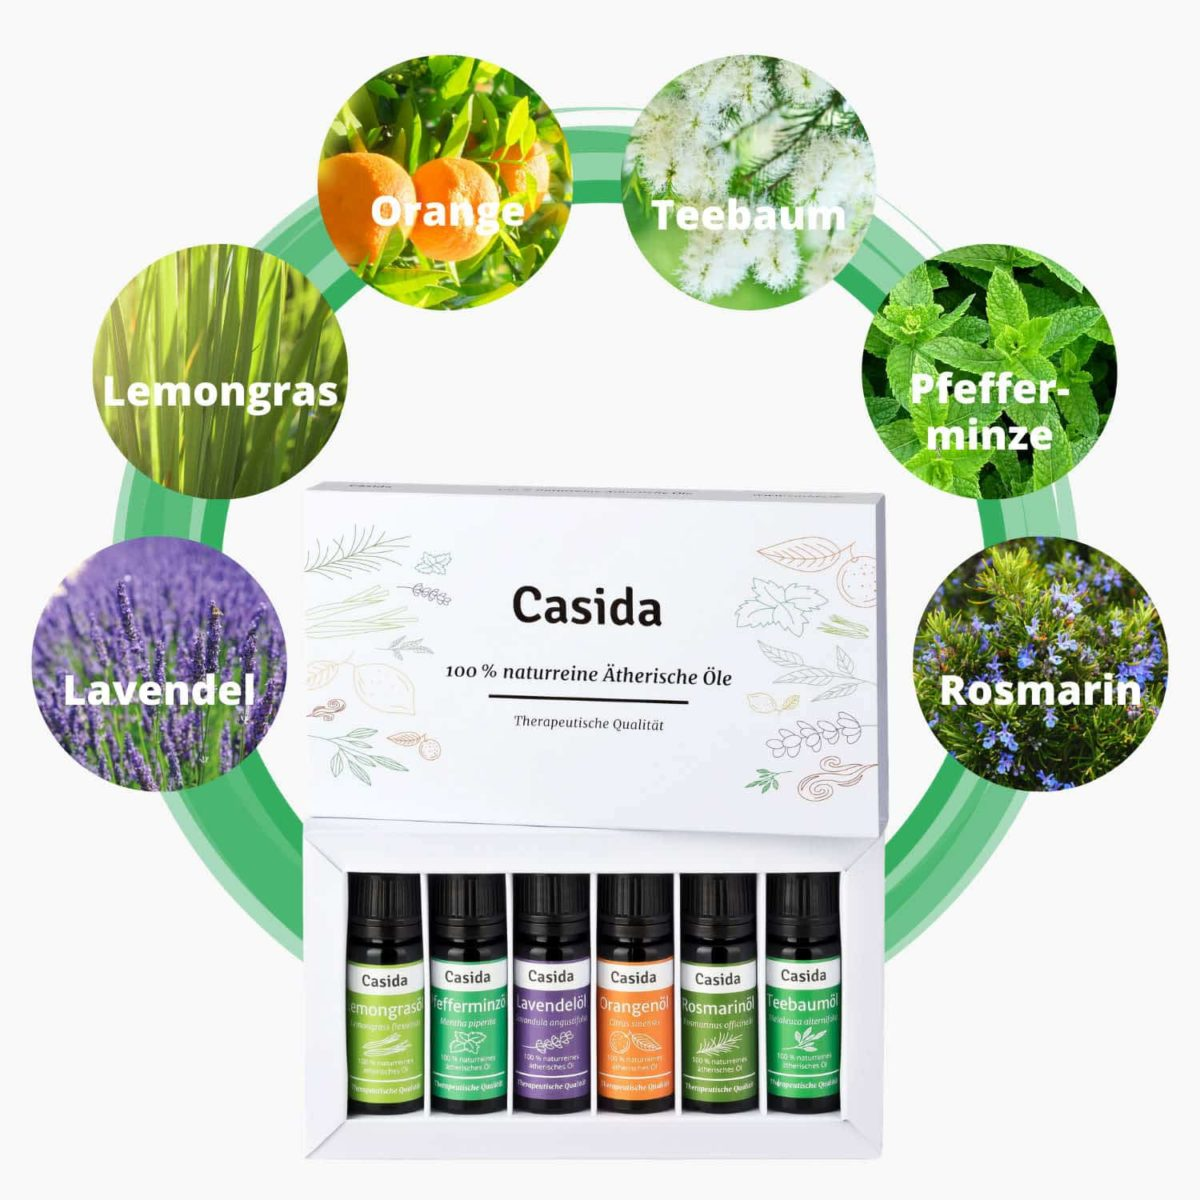 Casida Set Aroma Diffuser in wood print and TOP 6 essential oils 16247292 15880805 PZN Apotheke ätherische Öle Aromatherapie8